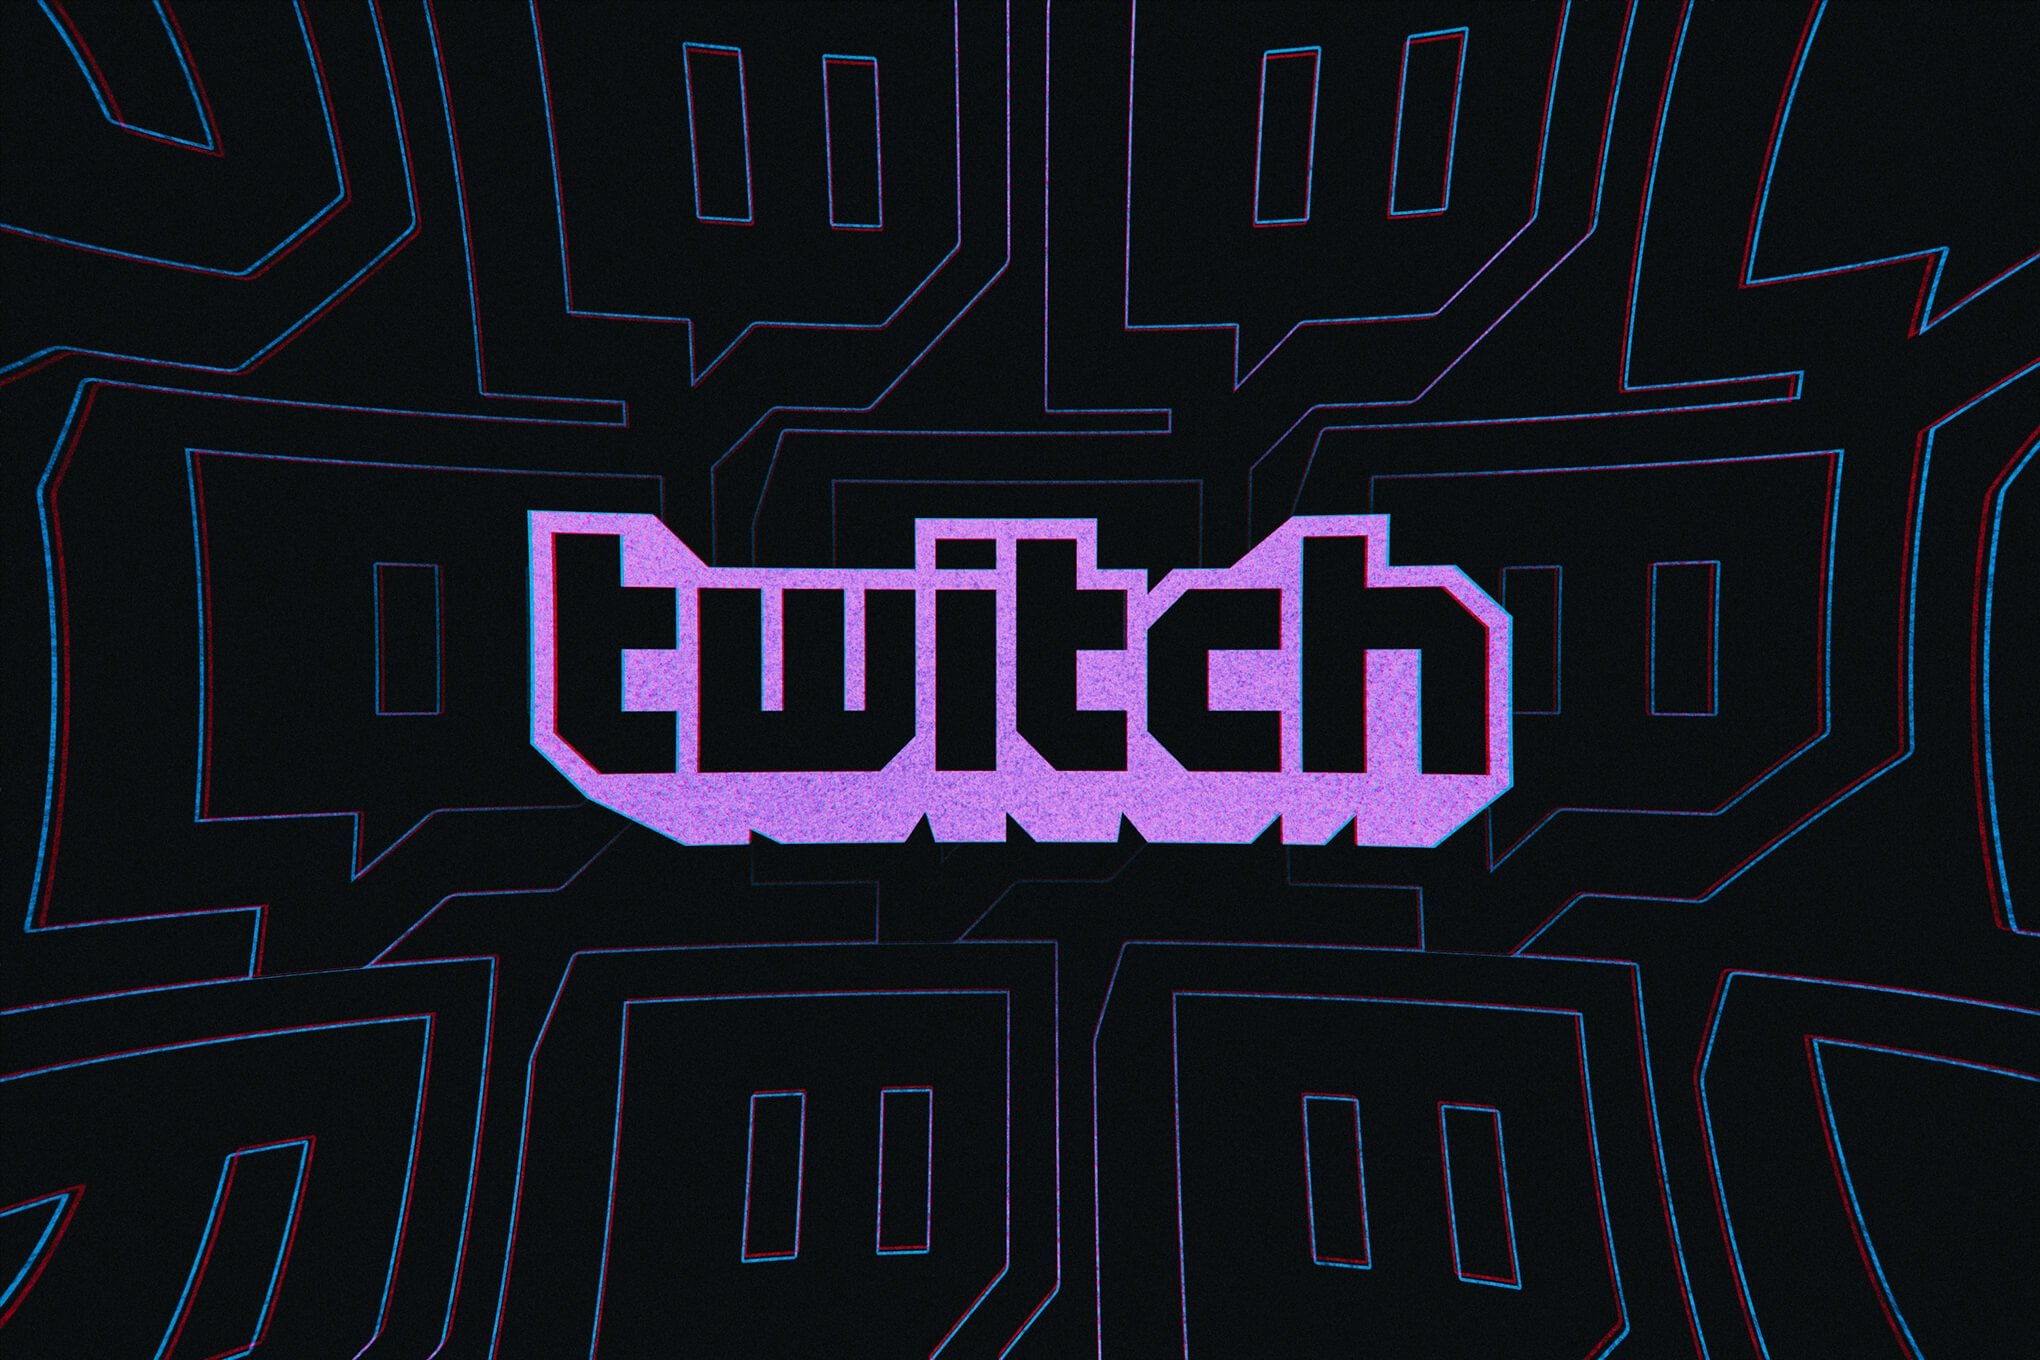 Twitch Nicknames (Marginal, Cool, Stylish)